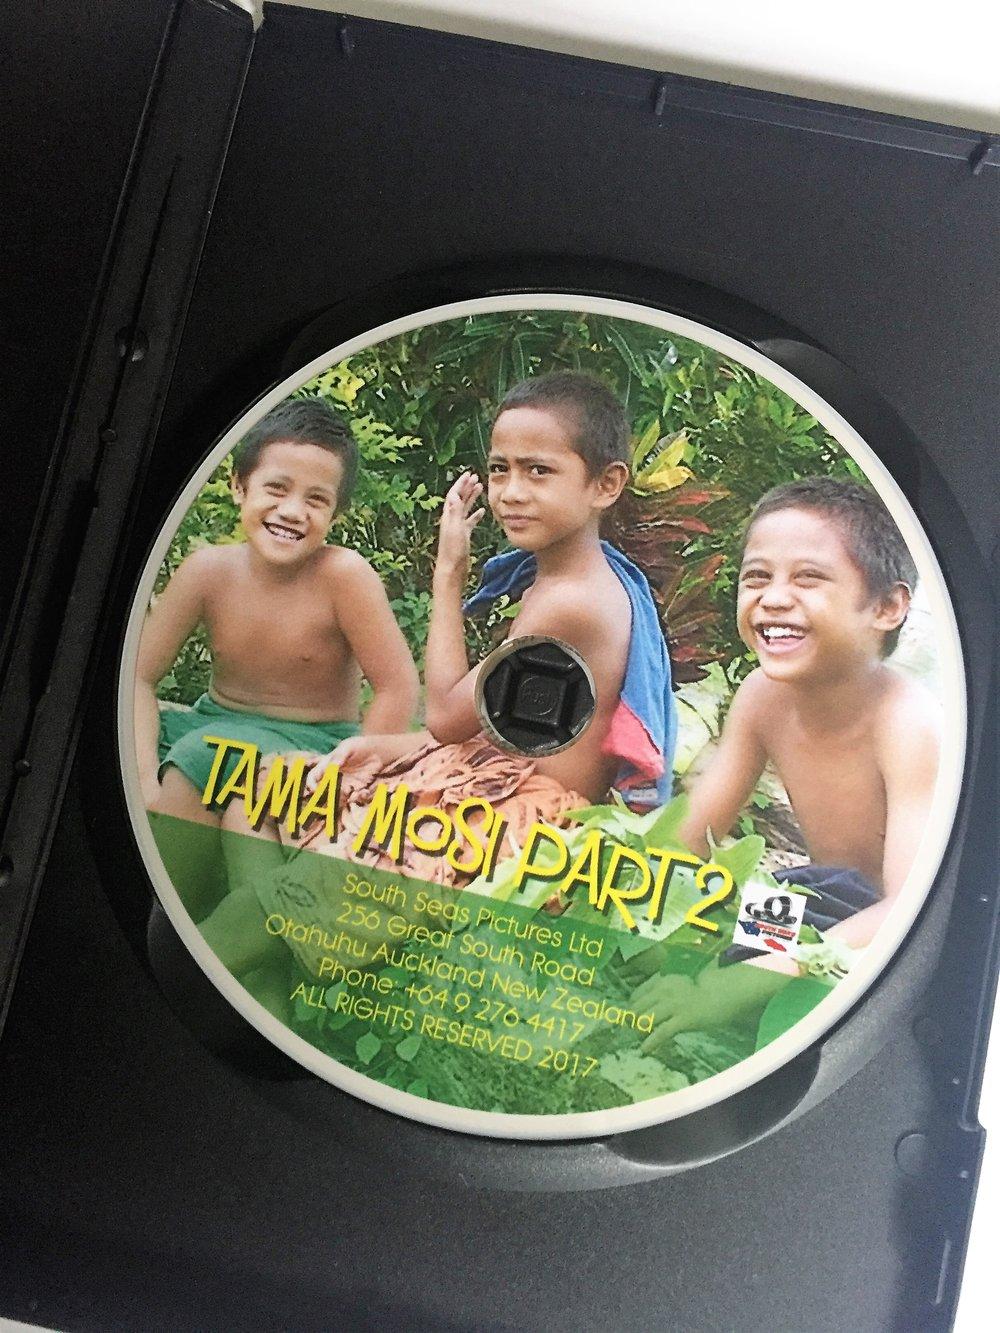 Image of Tama Mosi Part 2